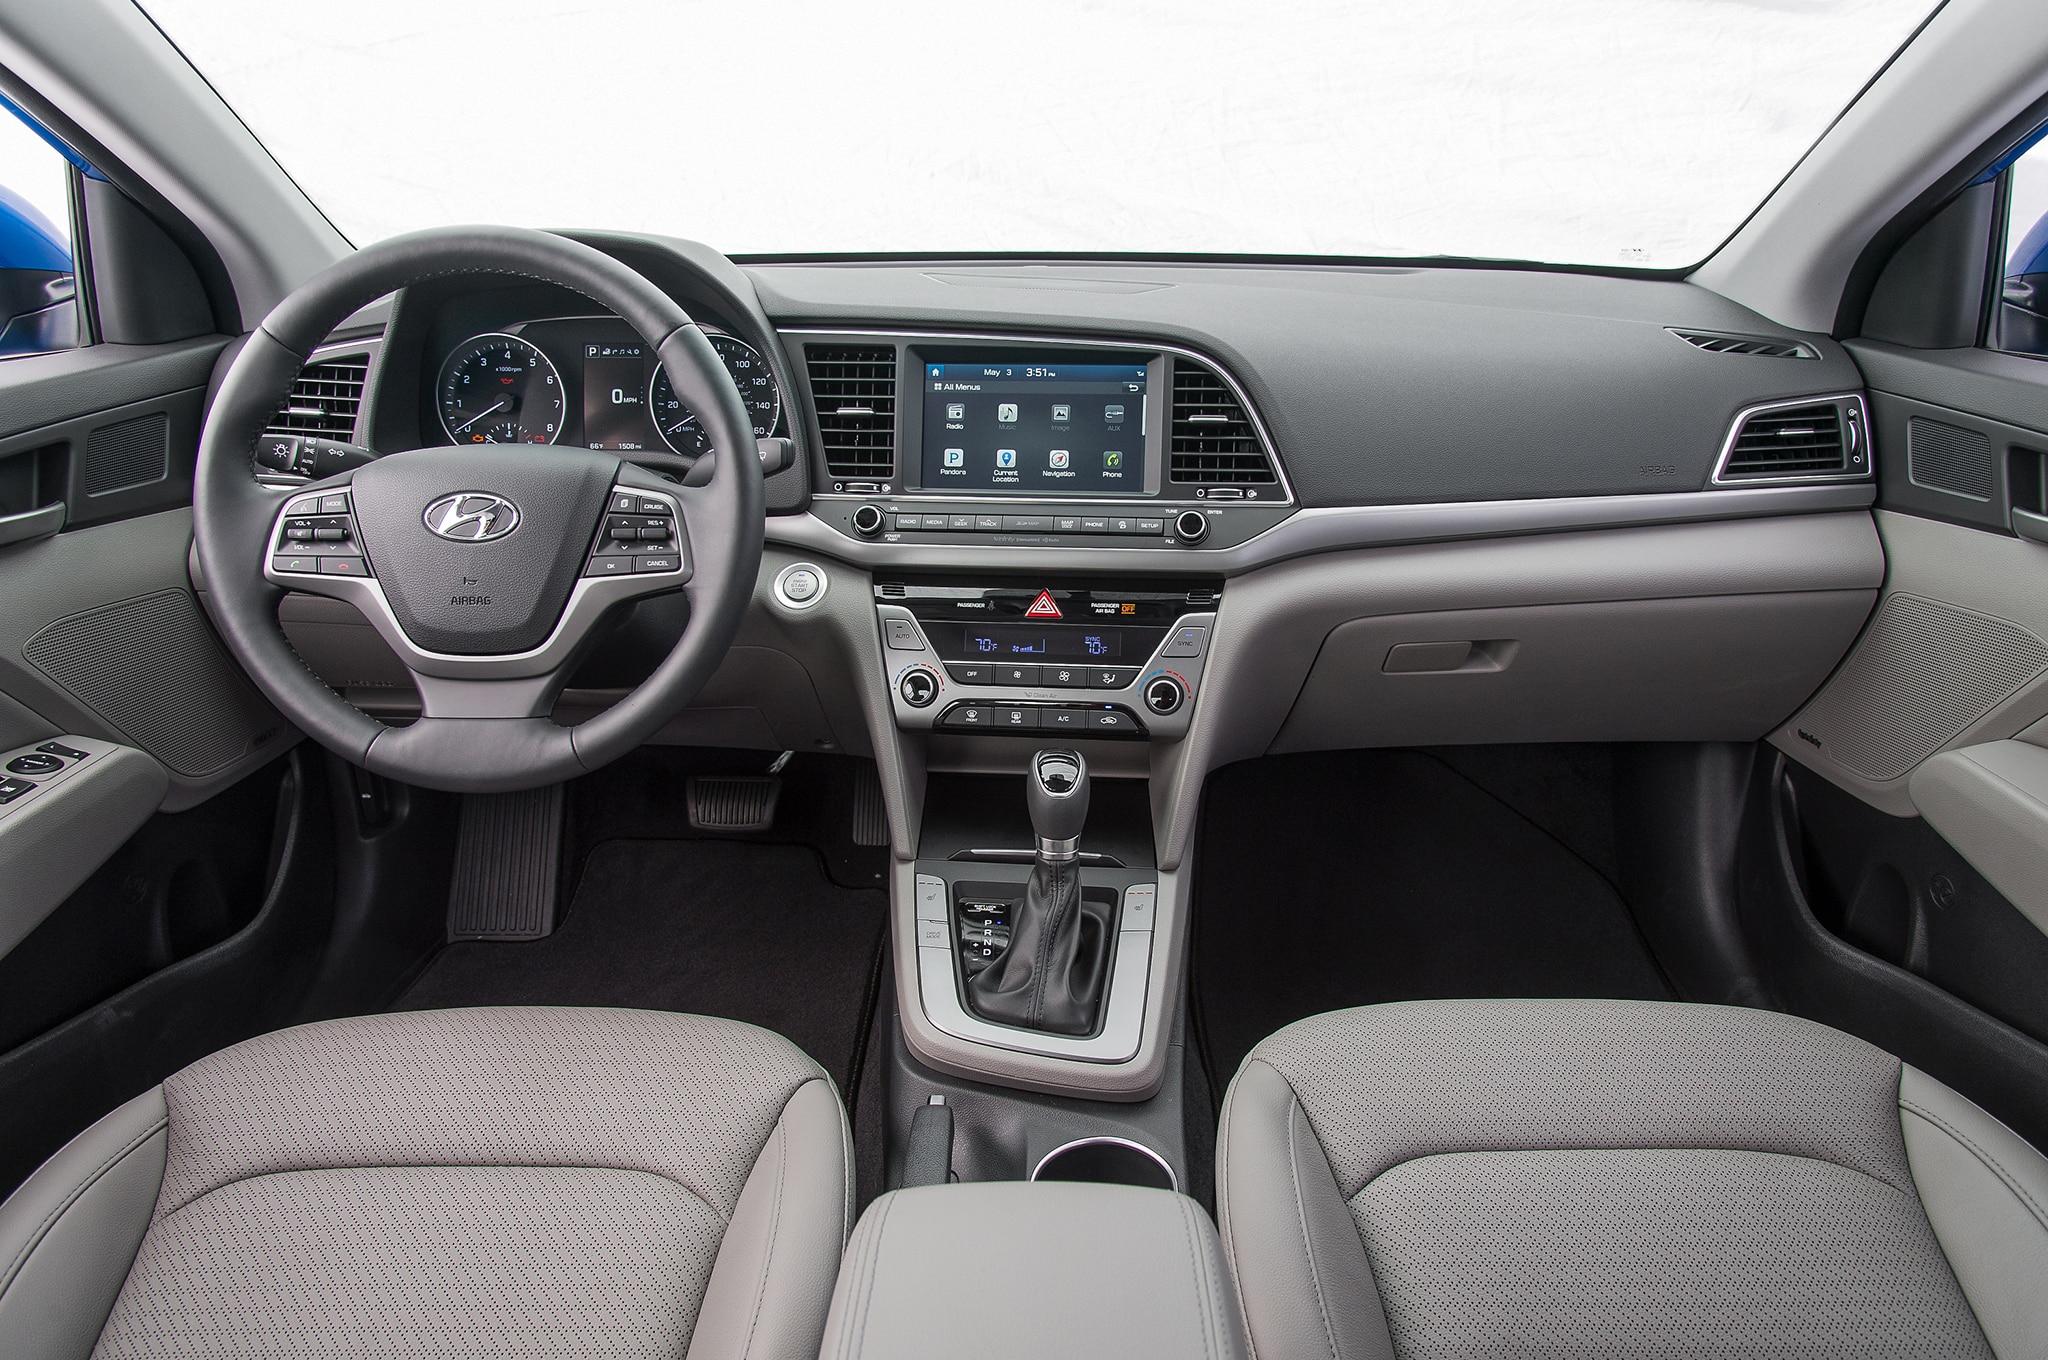 2016 Hyundai Elantra Limited Interior 15 Agosto Wpengine